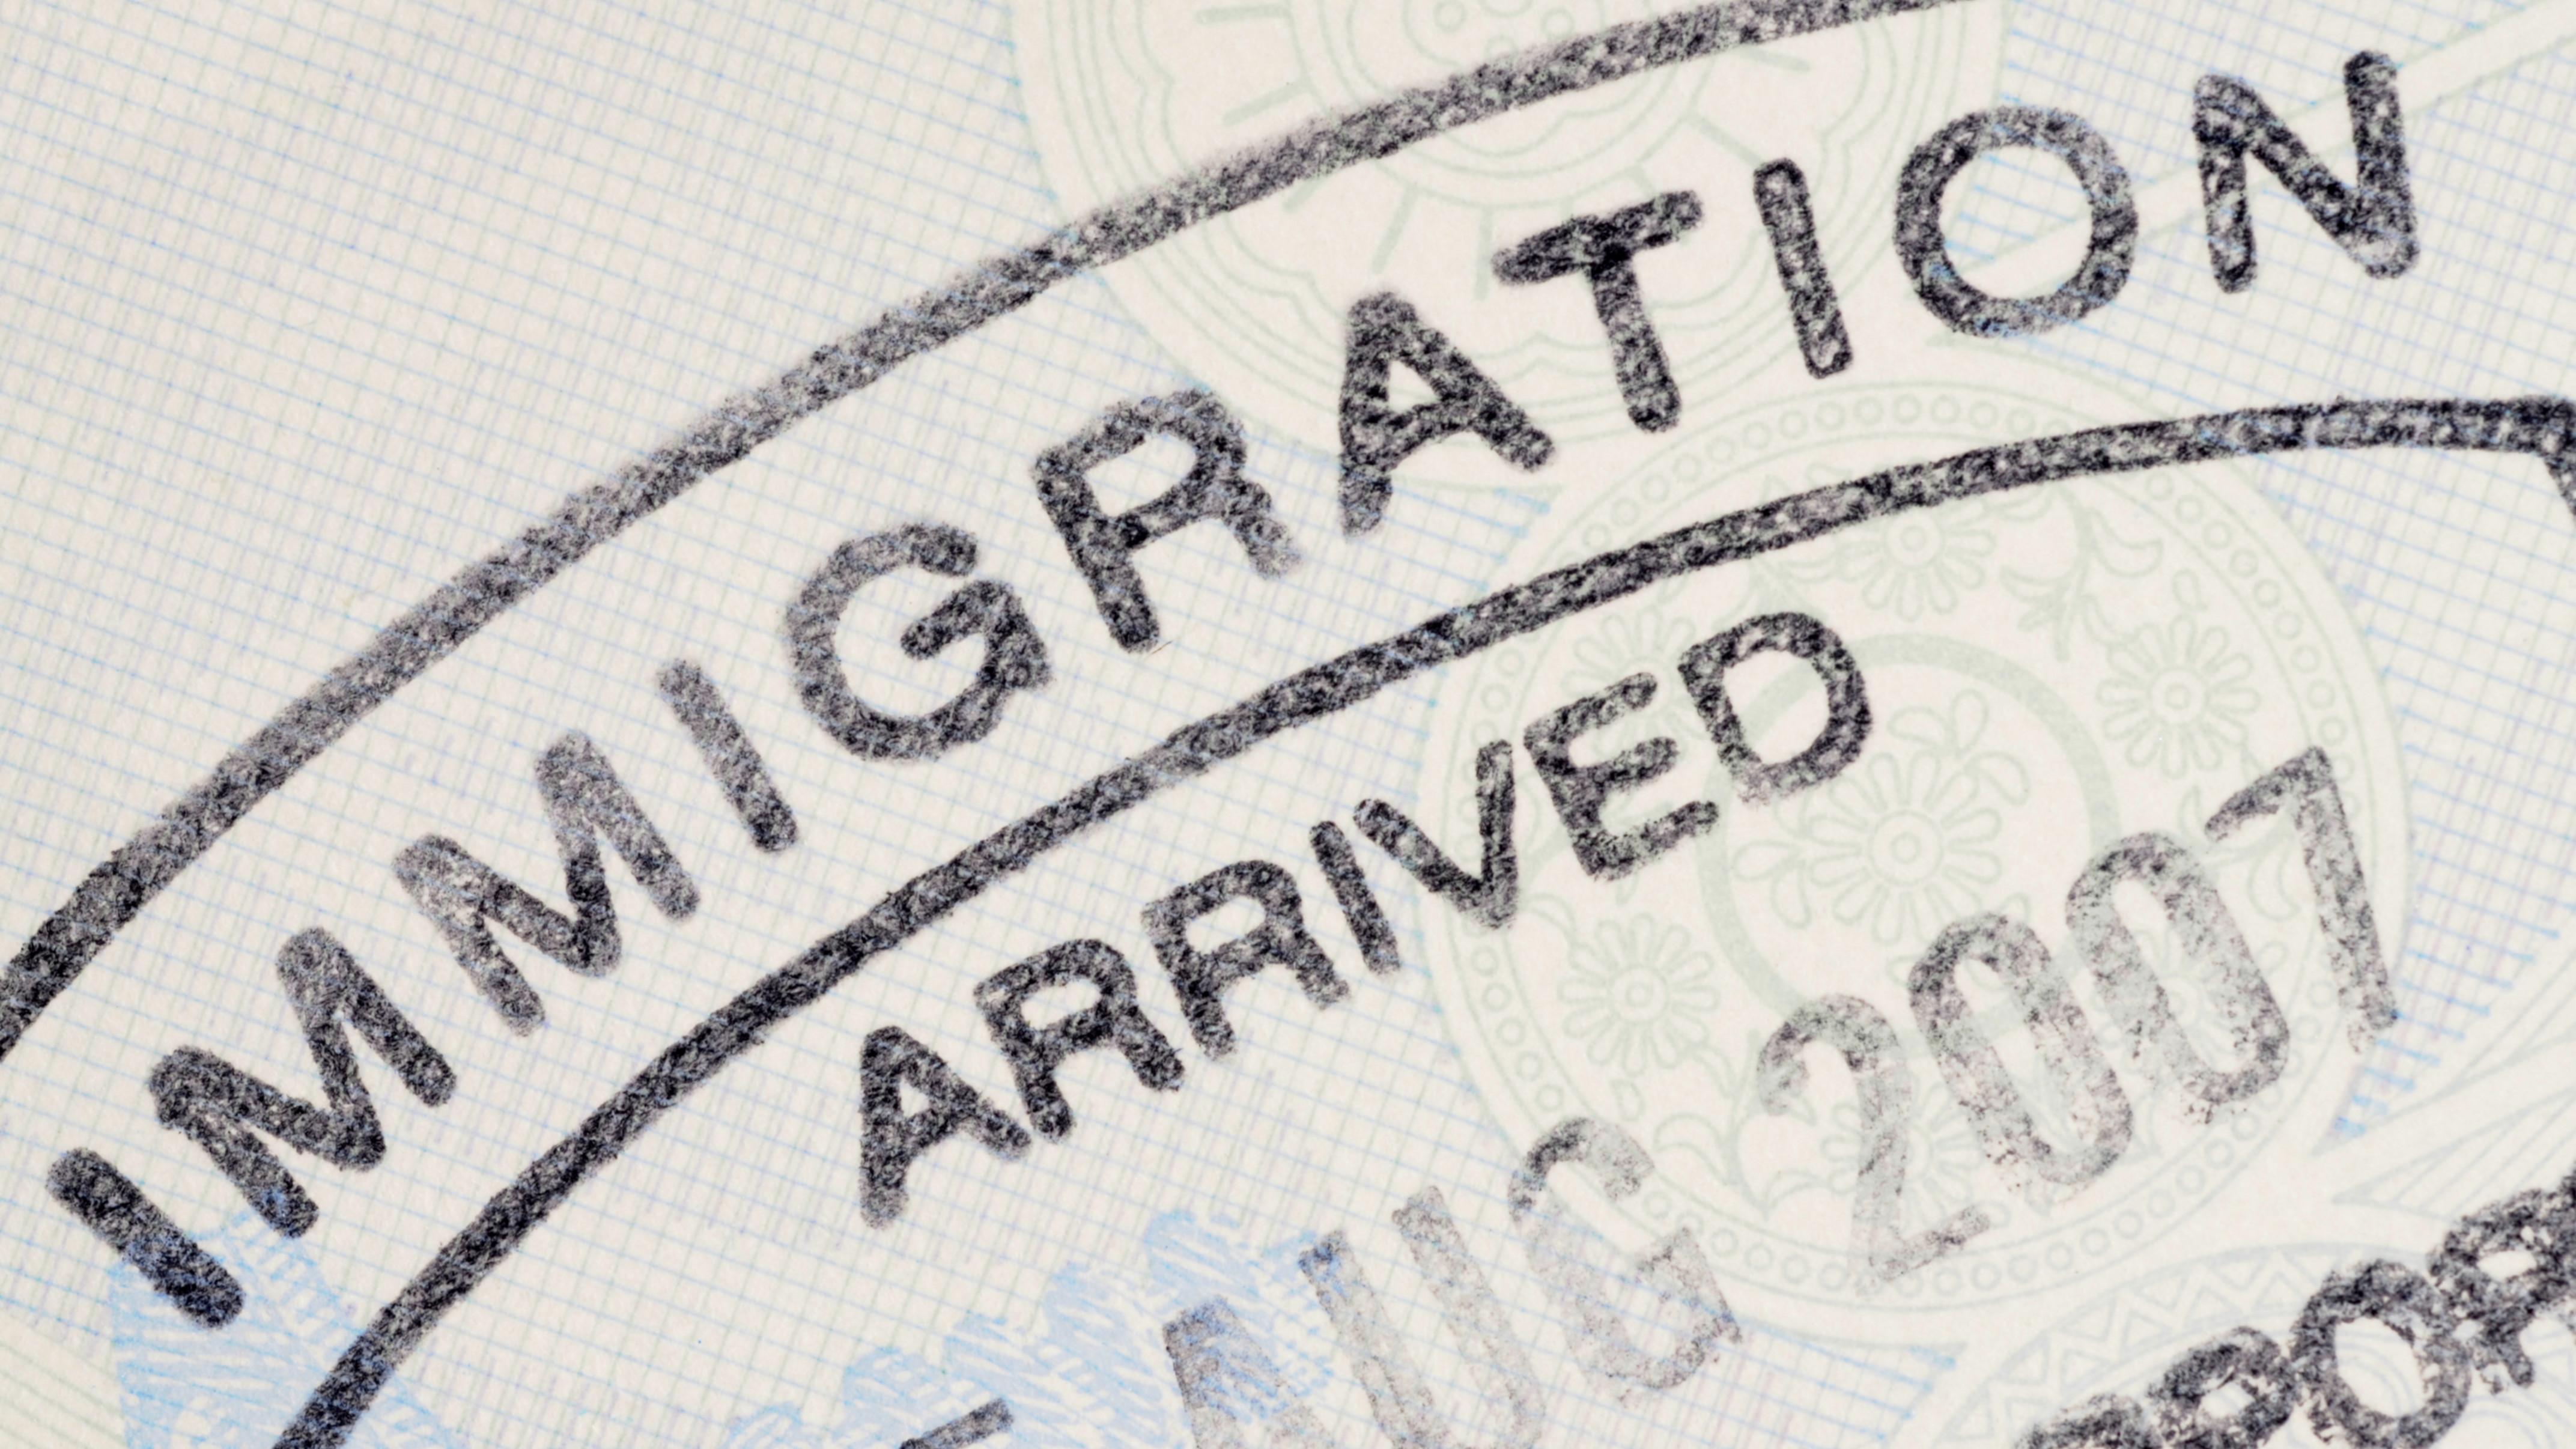 Specific Rules on Domestic Helper Visa in Hong Kong